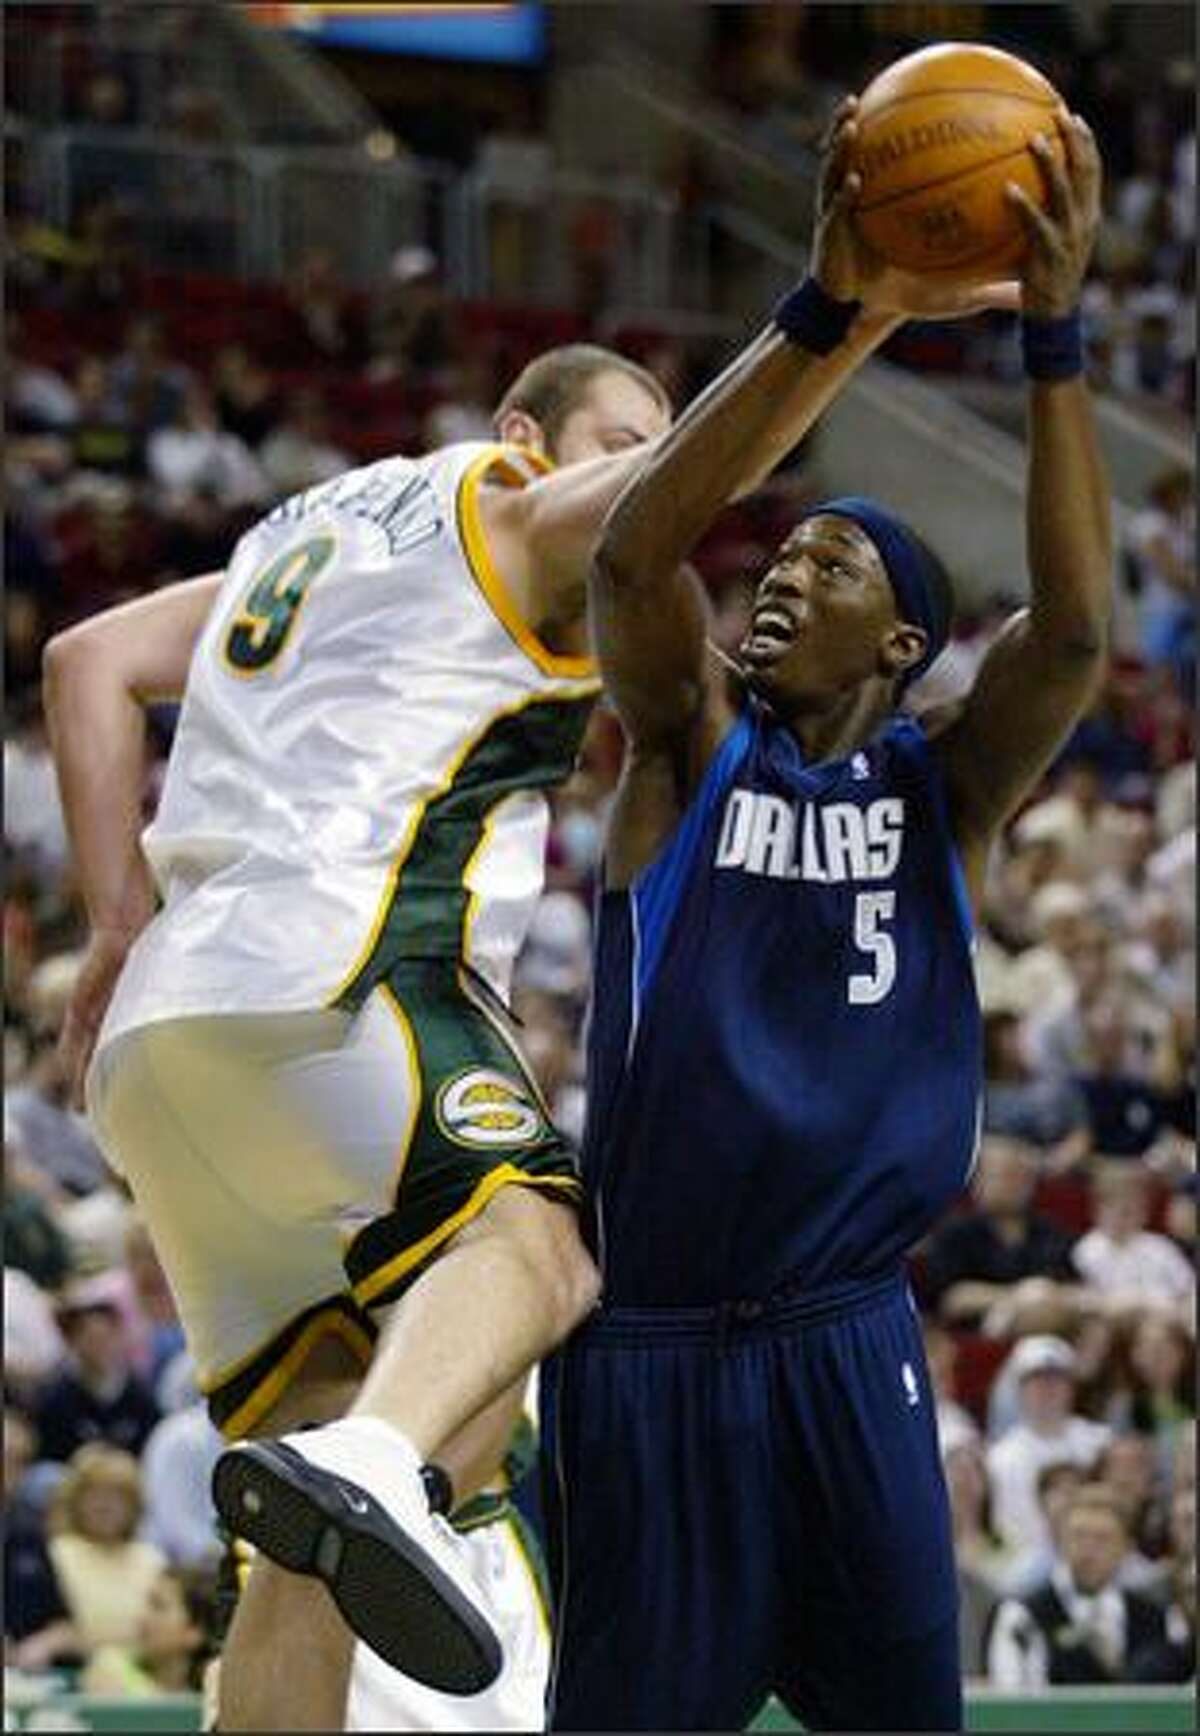 Dallas Mavericks' Josh Howard (5) drives around Seattle SuperSonics' Vitaly Potapenko of Ukraine in the first quarter in Seattle, Saturday, April 10, 2004. (AP Photo/John Froschauer)